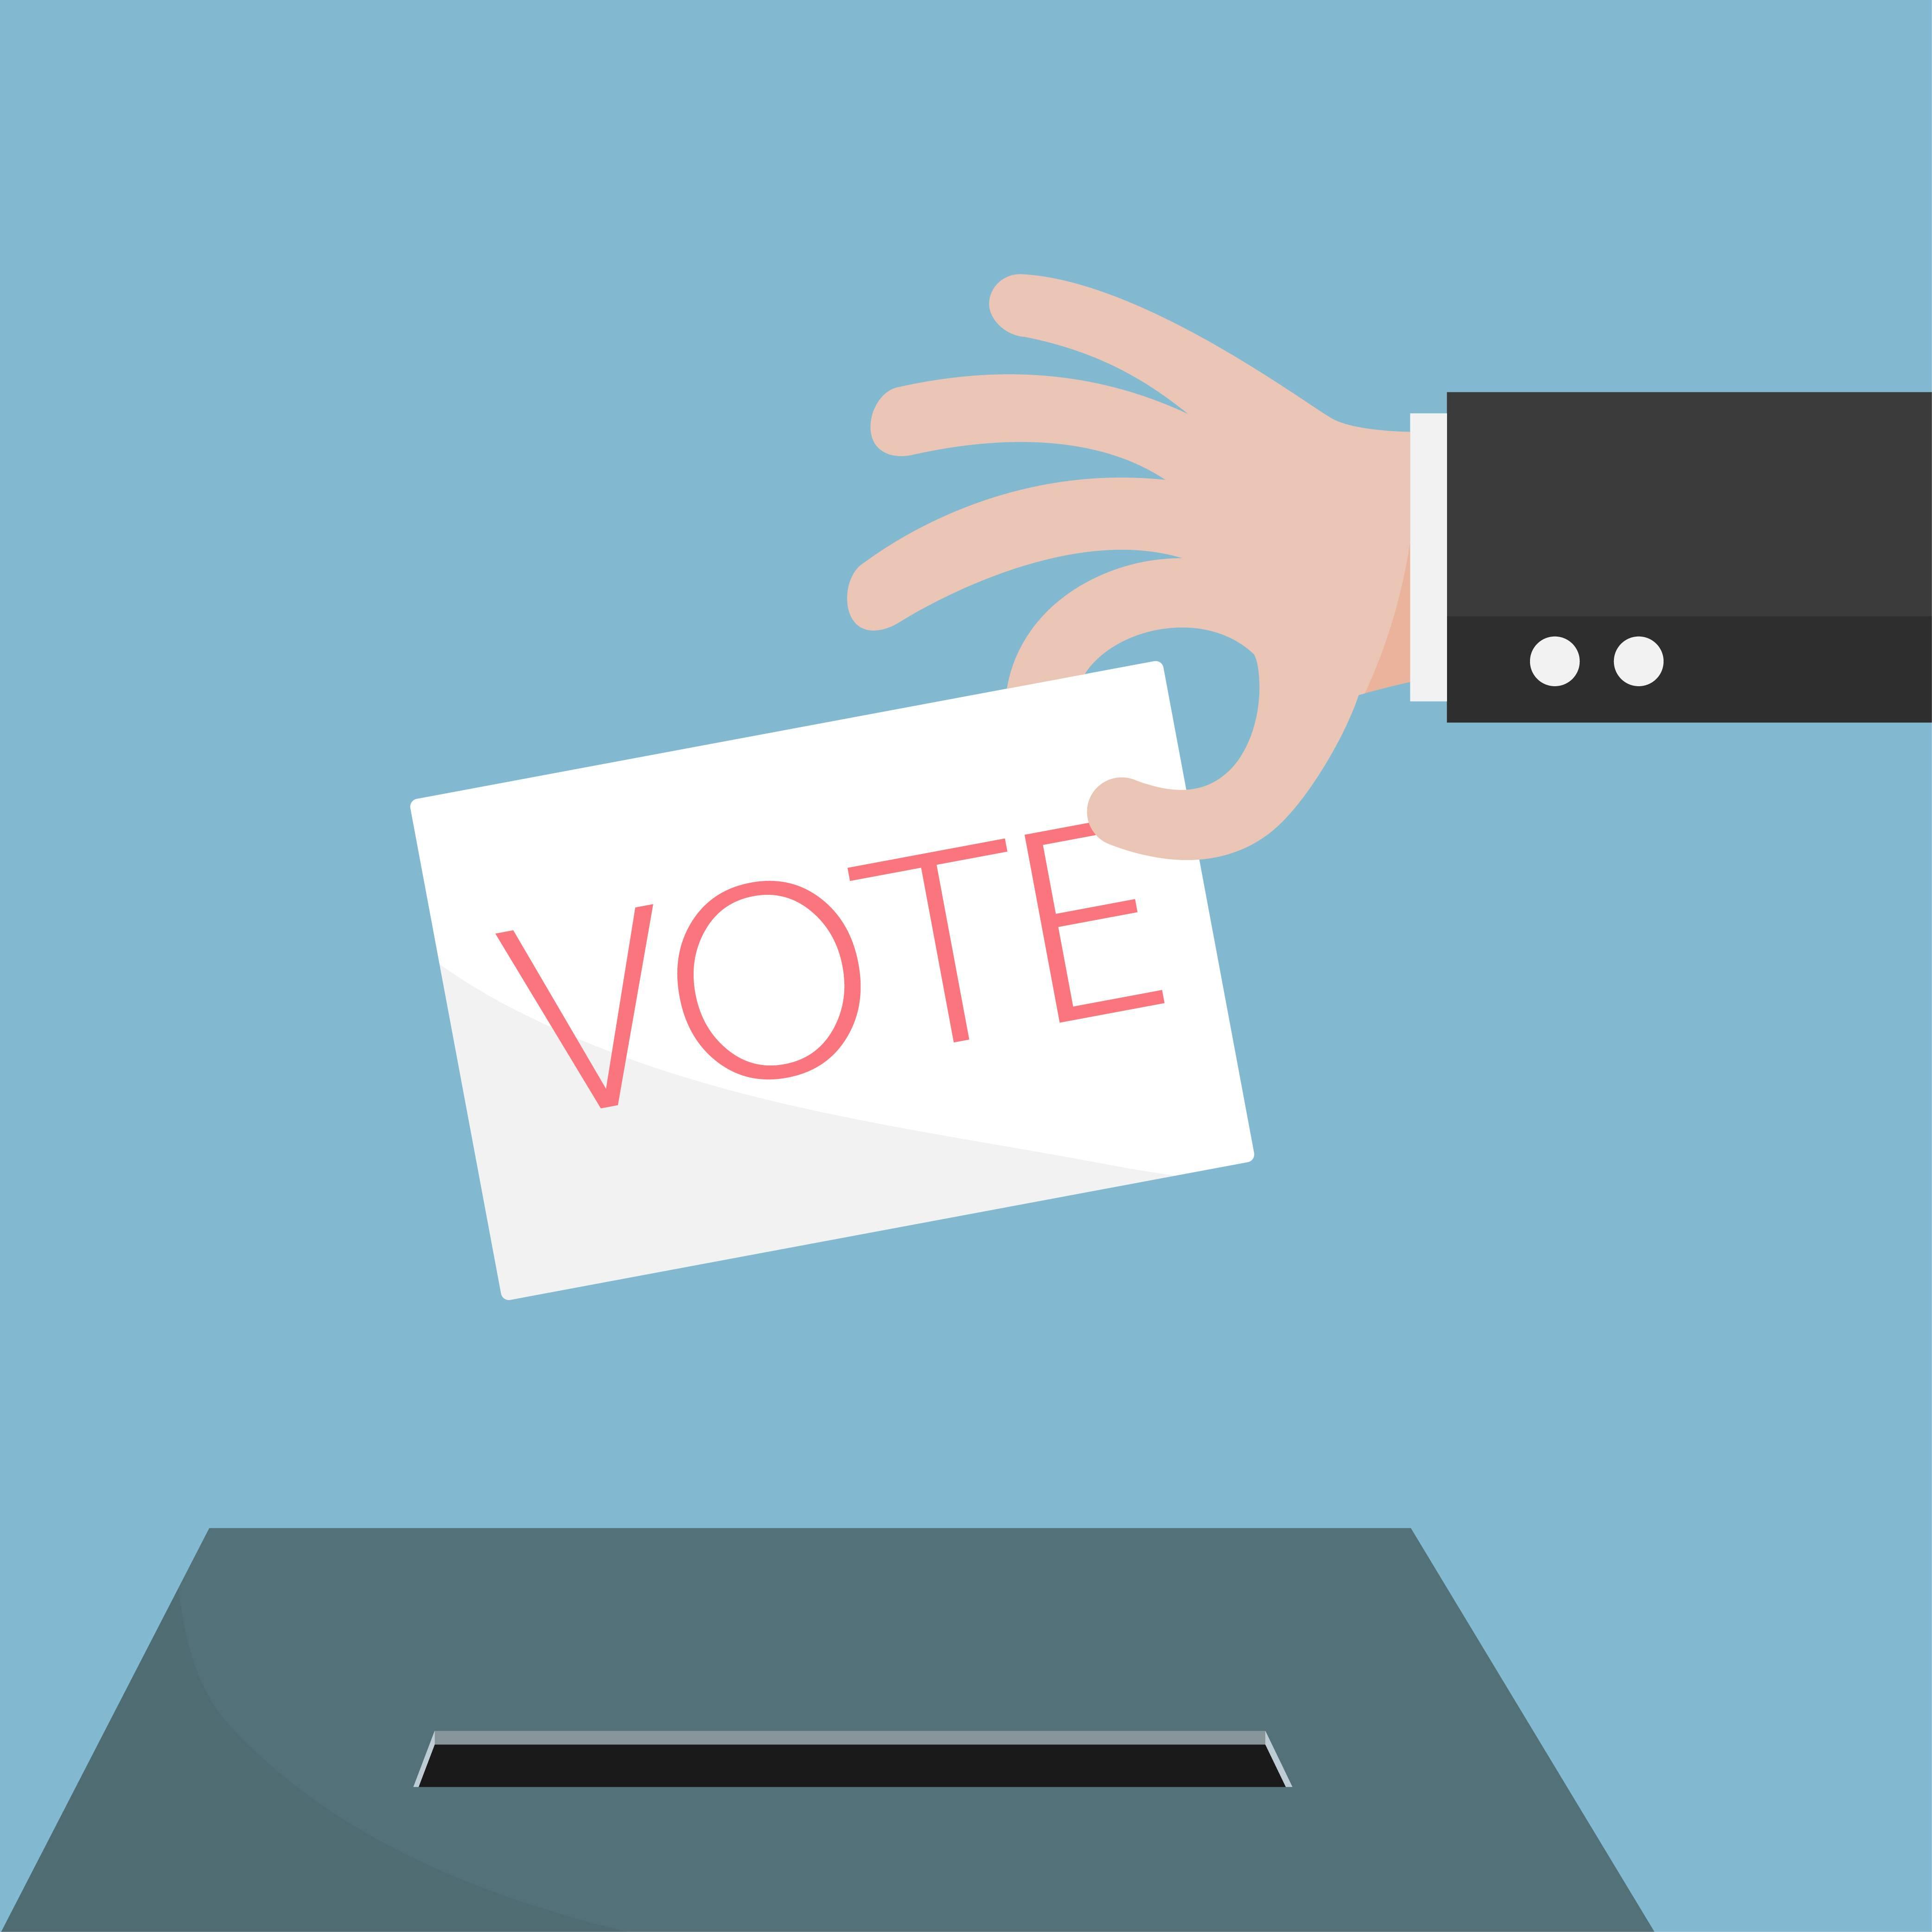 voteillustration-ef07eb397510b17bdbd8d948b13363db.jpg